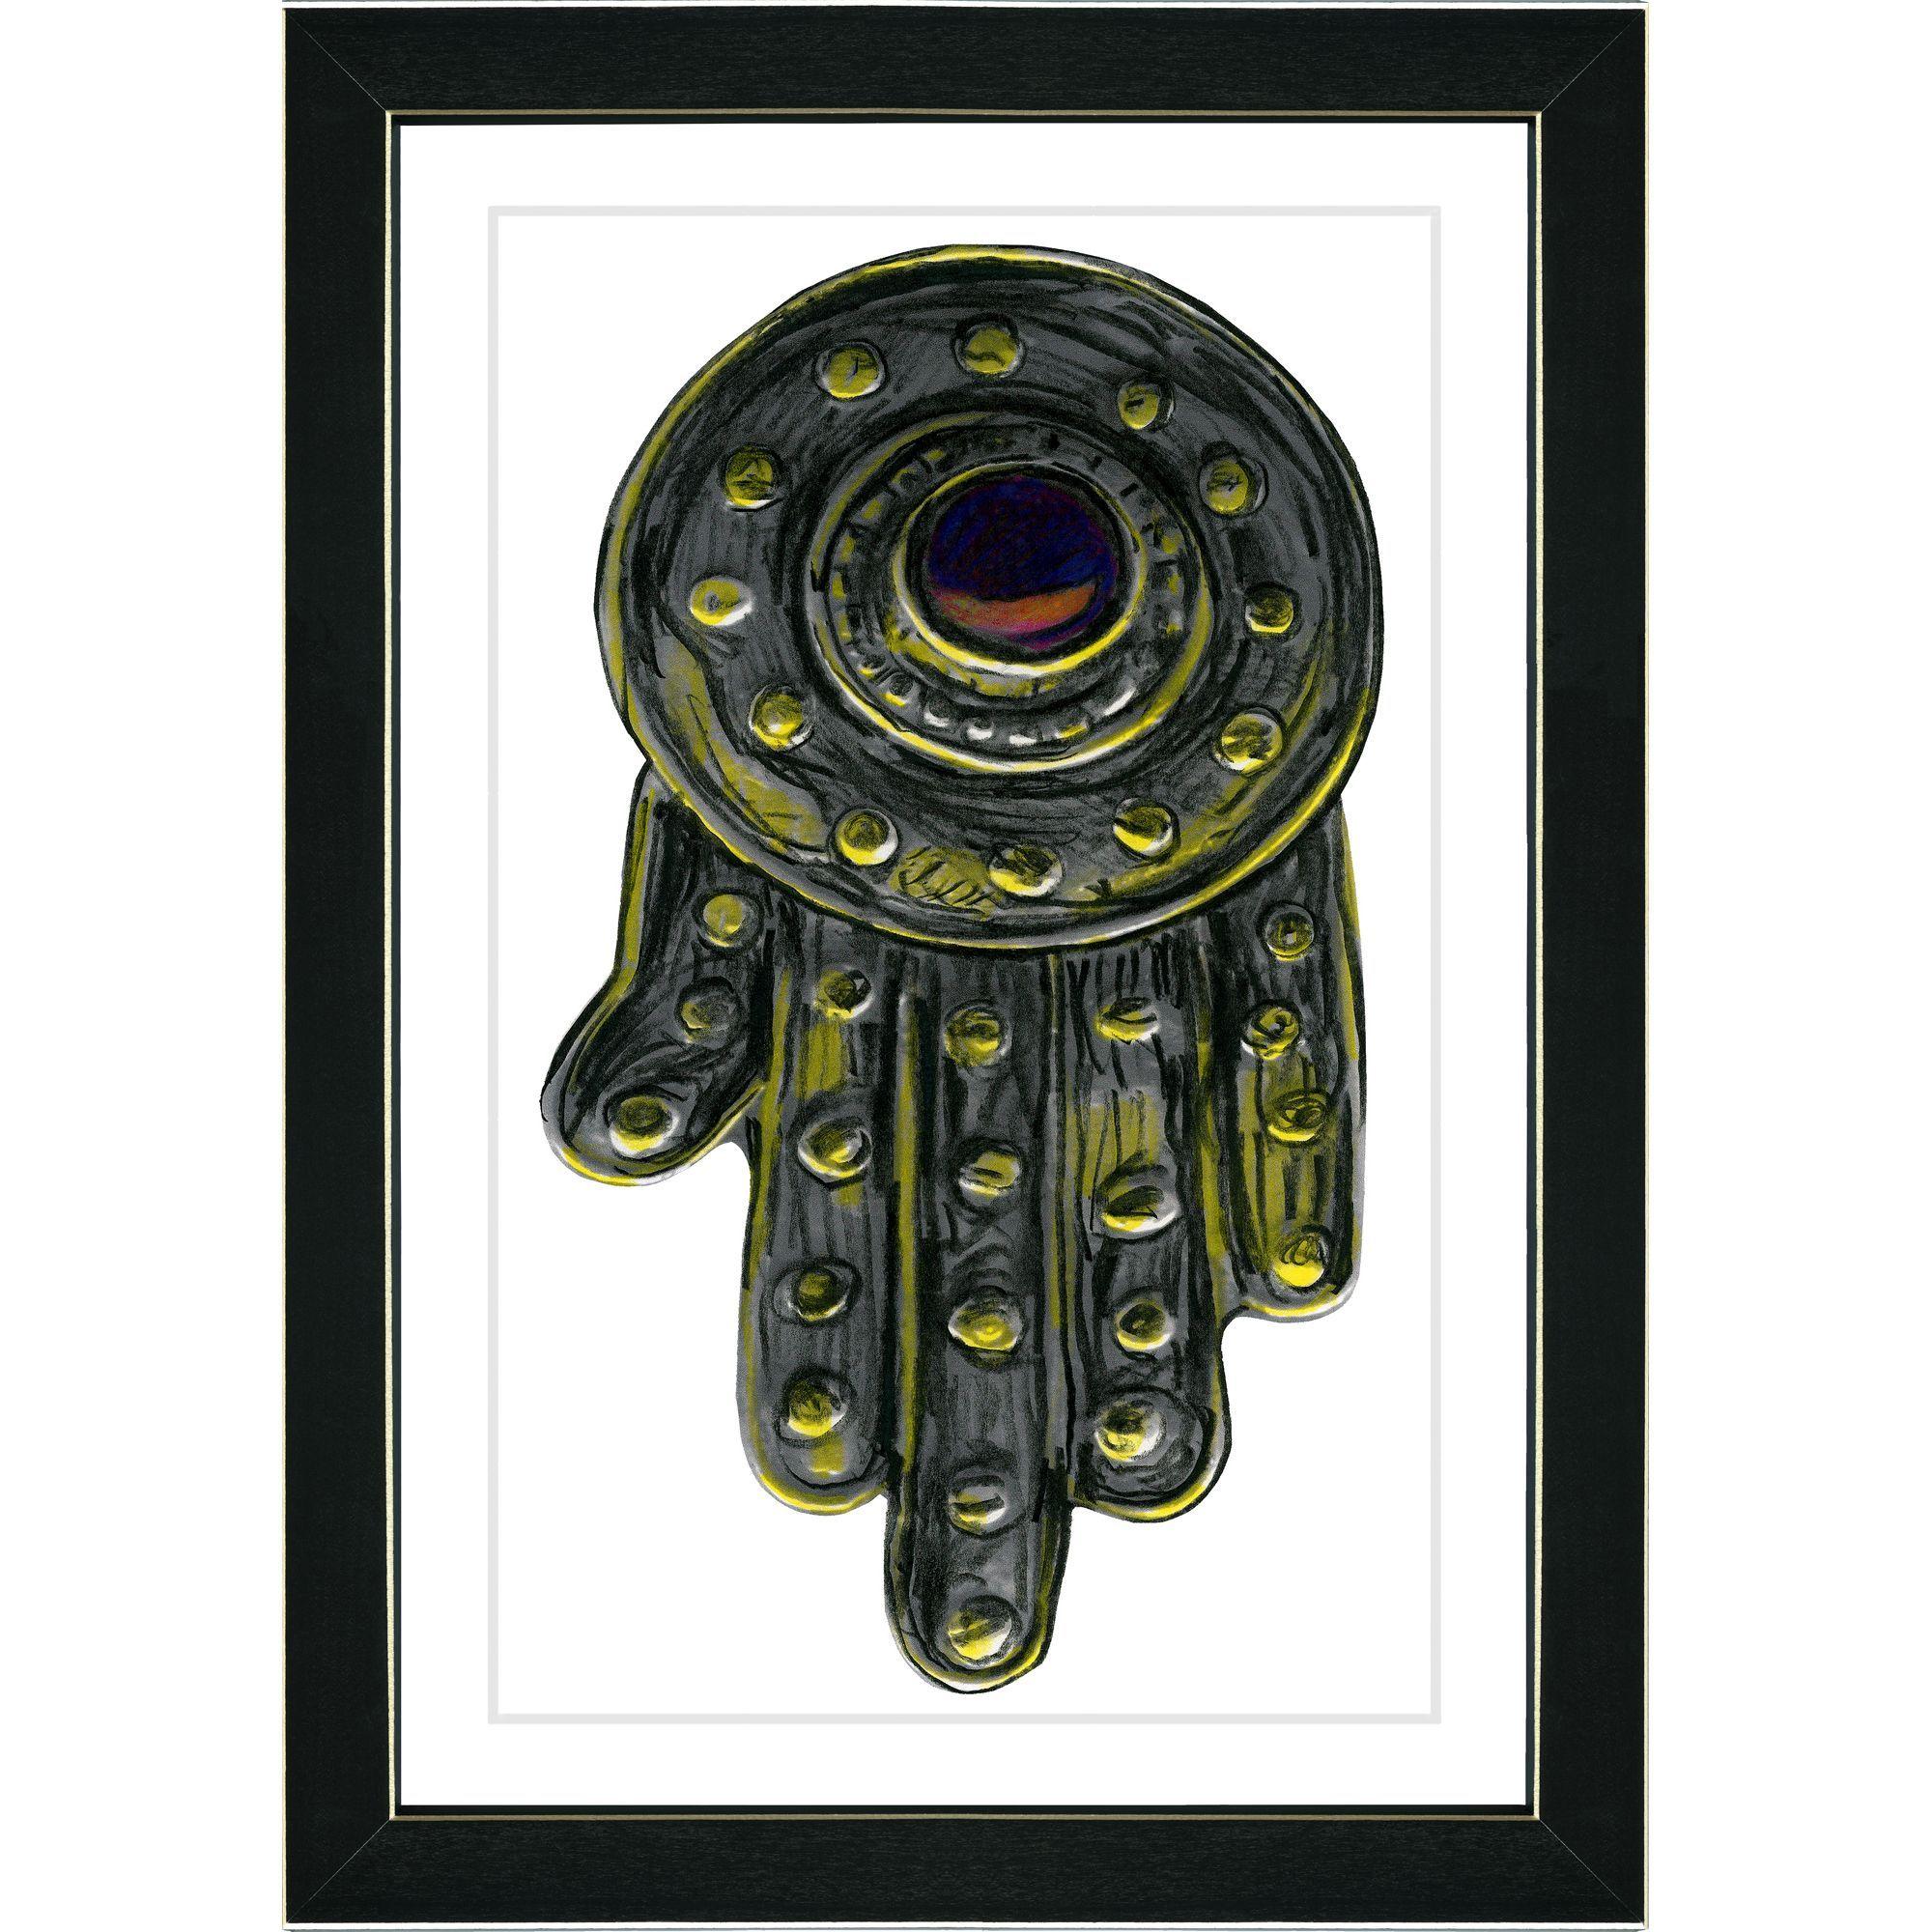 Liueartist zhee singerucliueucliuetitle uhand of godu framed art print